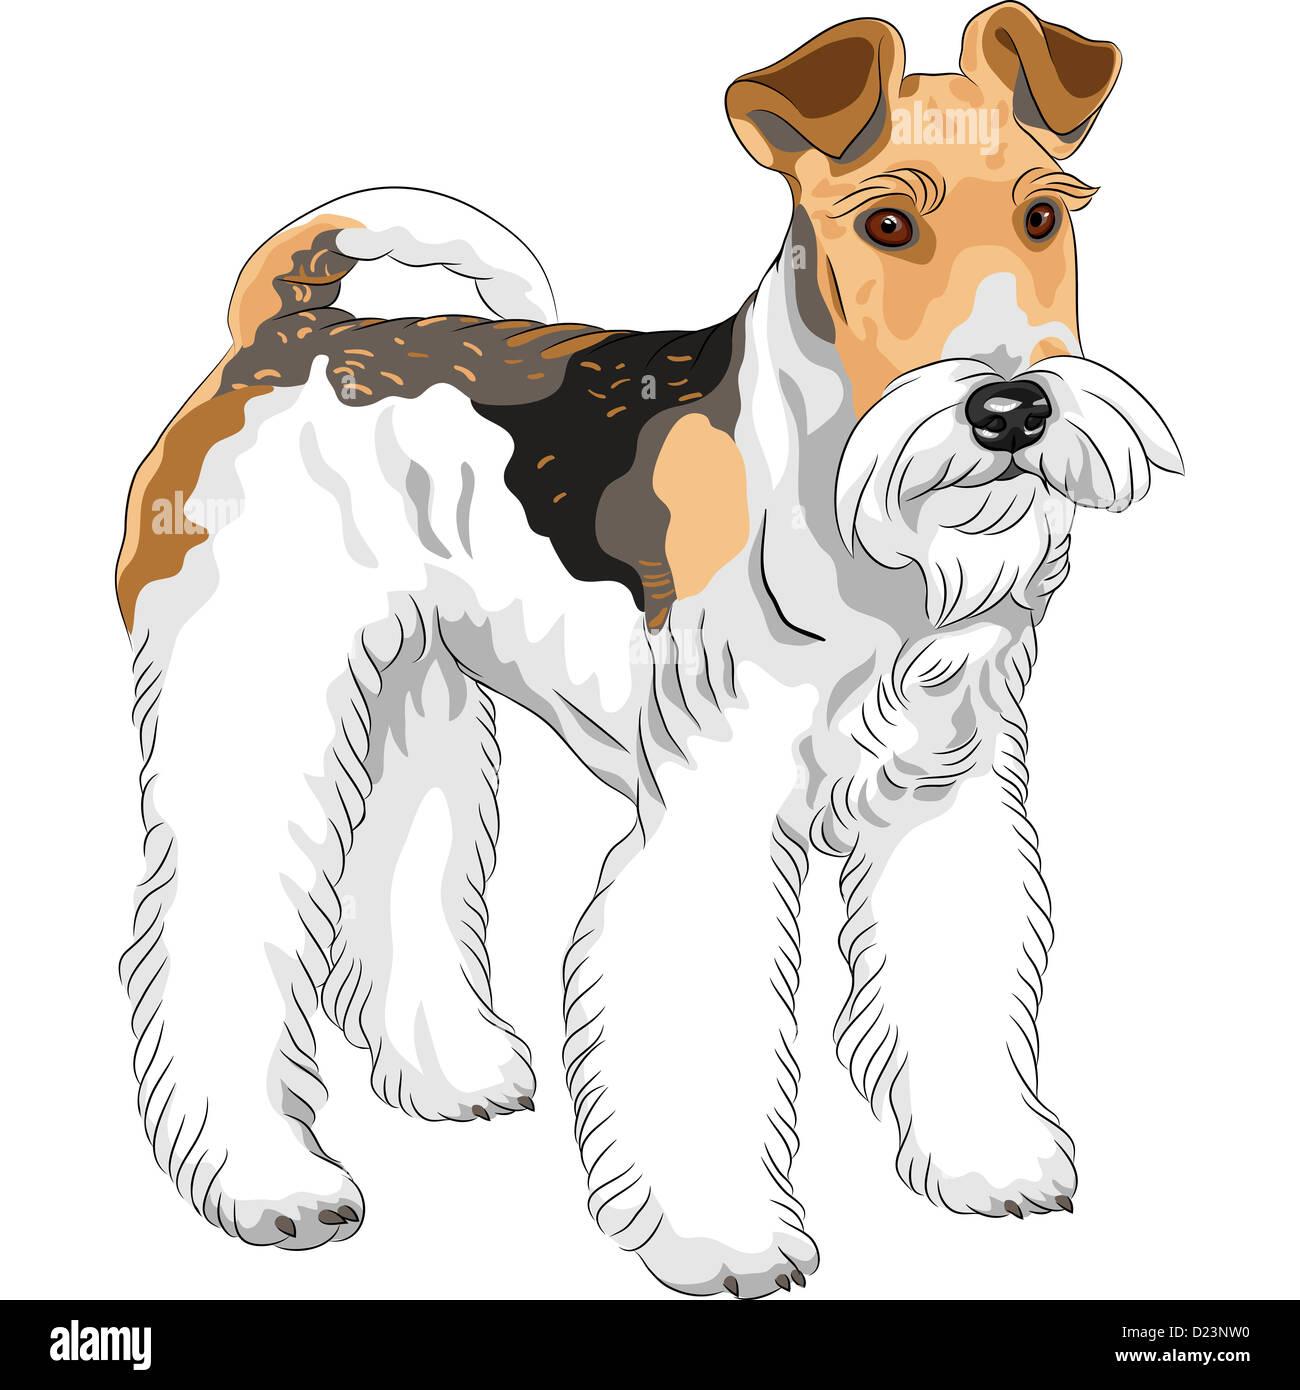 Brown Black Fox Terrier Dog Stock Photos & Brown Black Fox Terrier ...